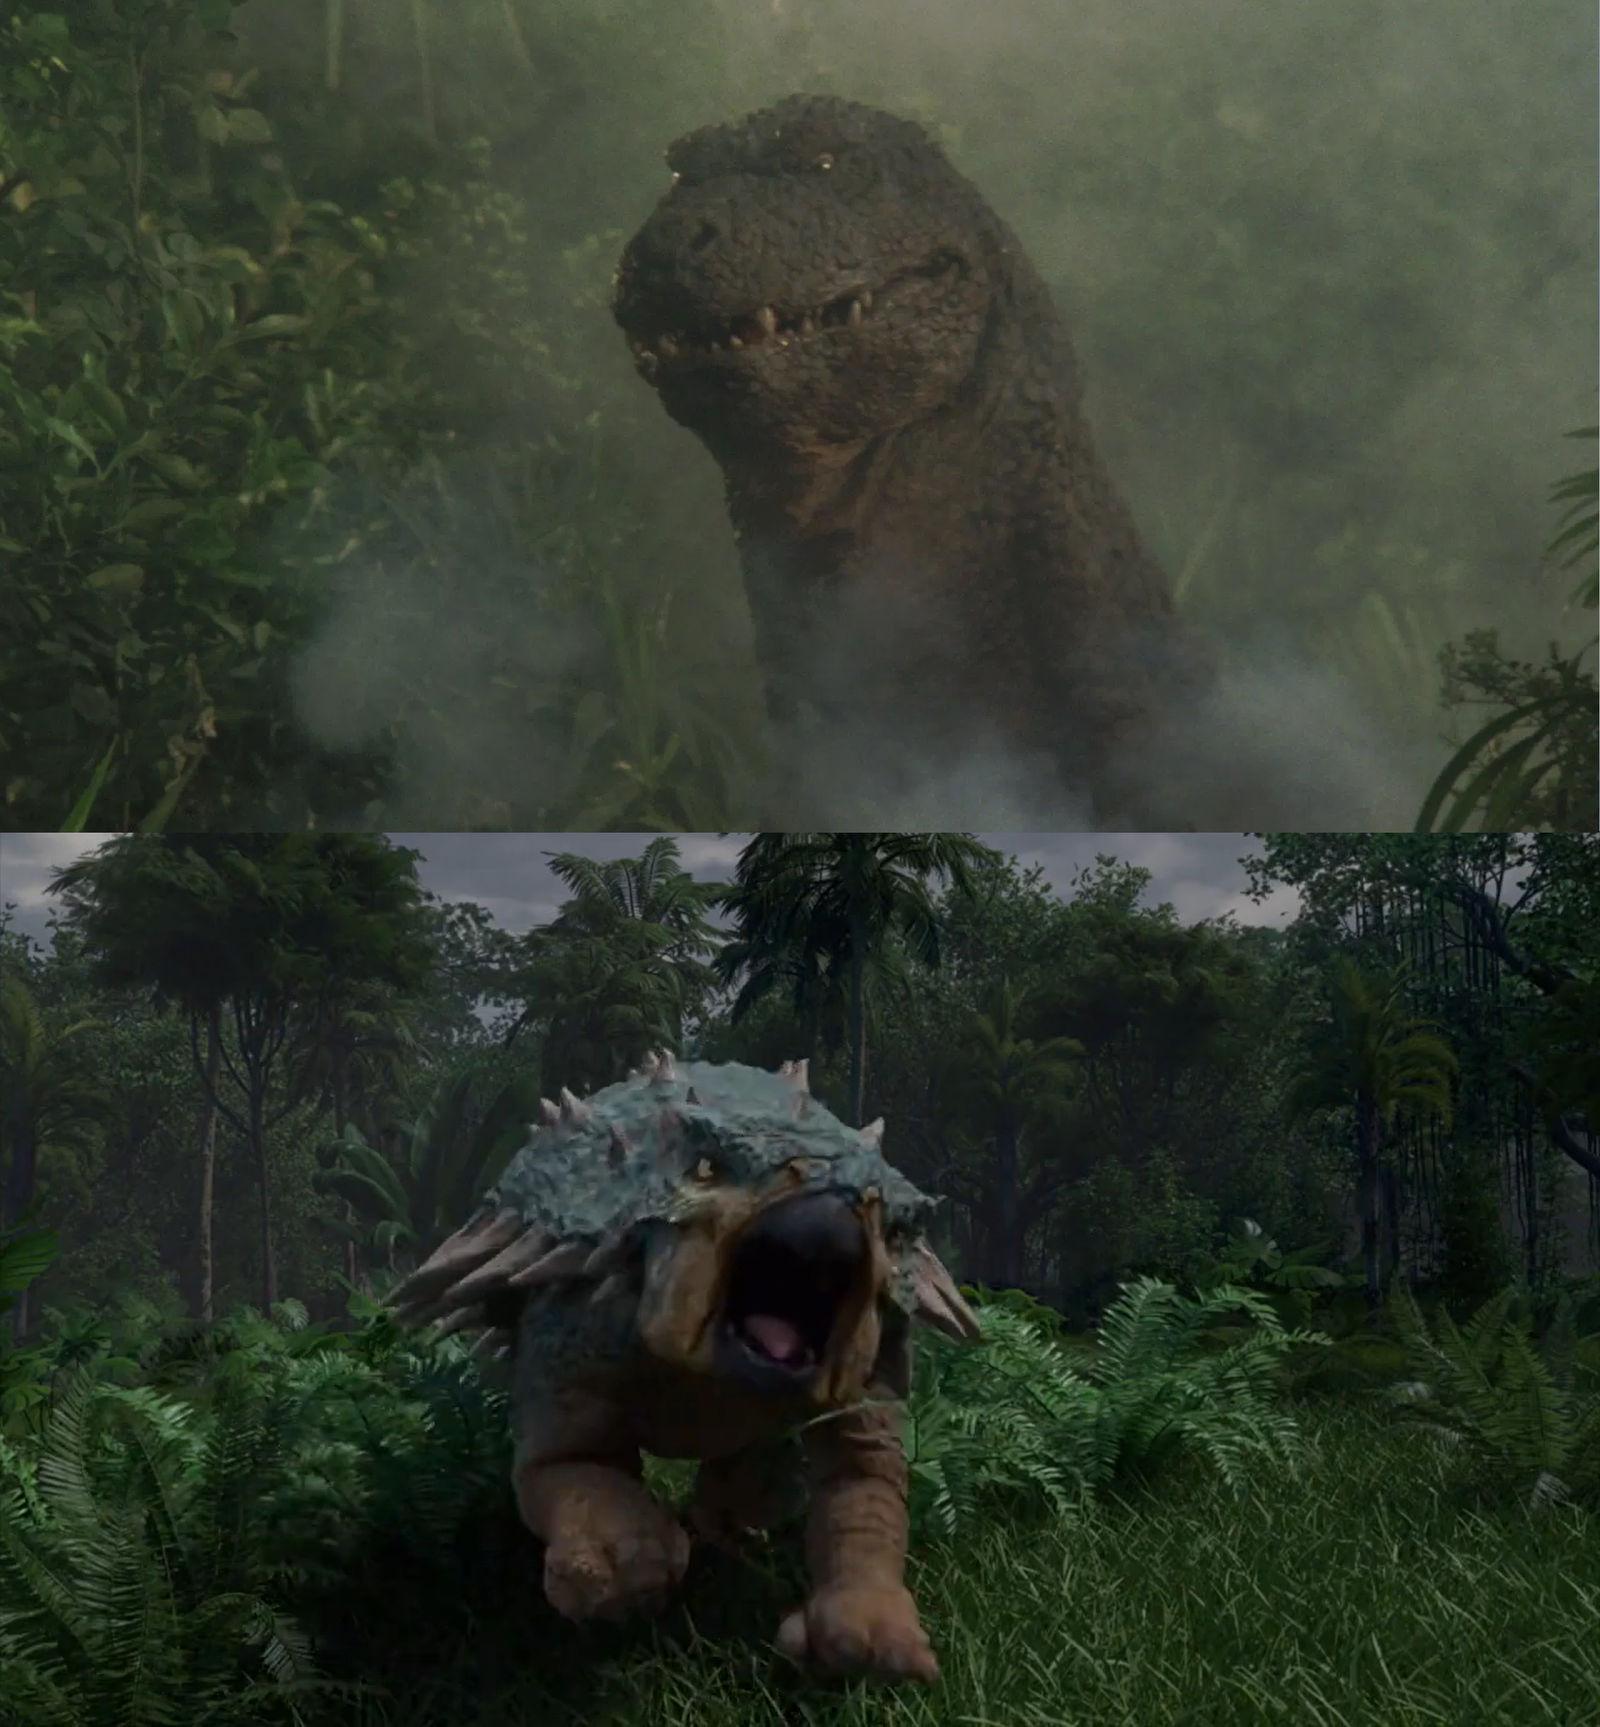 Bumpy vs Godzillasaurus by MnstrFrc 1600x1727